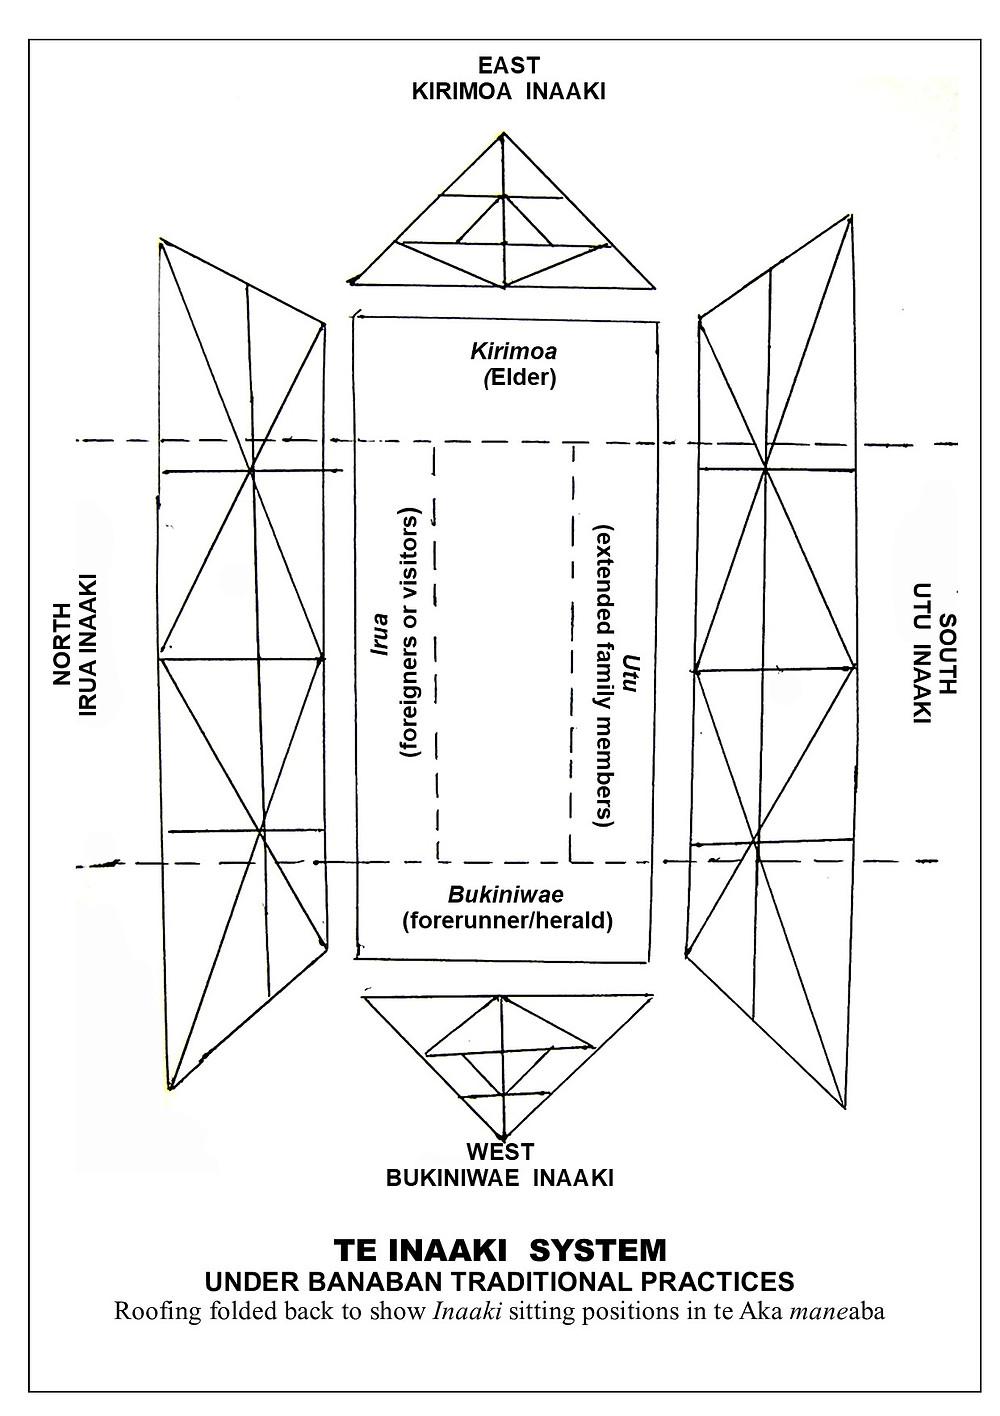 Te Inaaki original Te Aka system of governance in maneaba